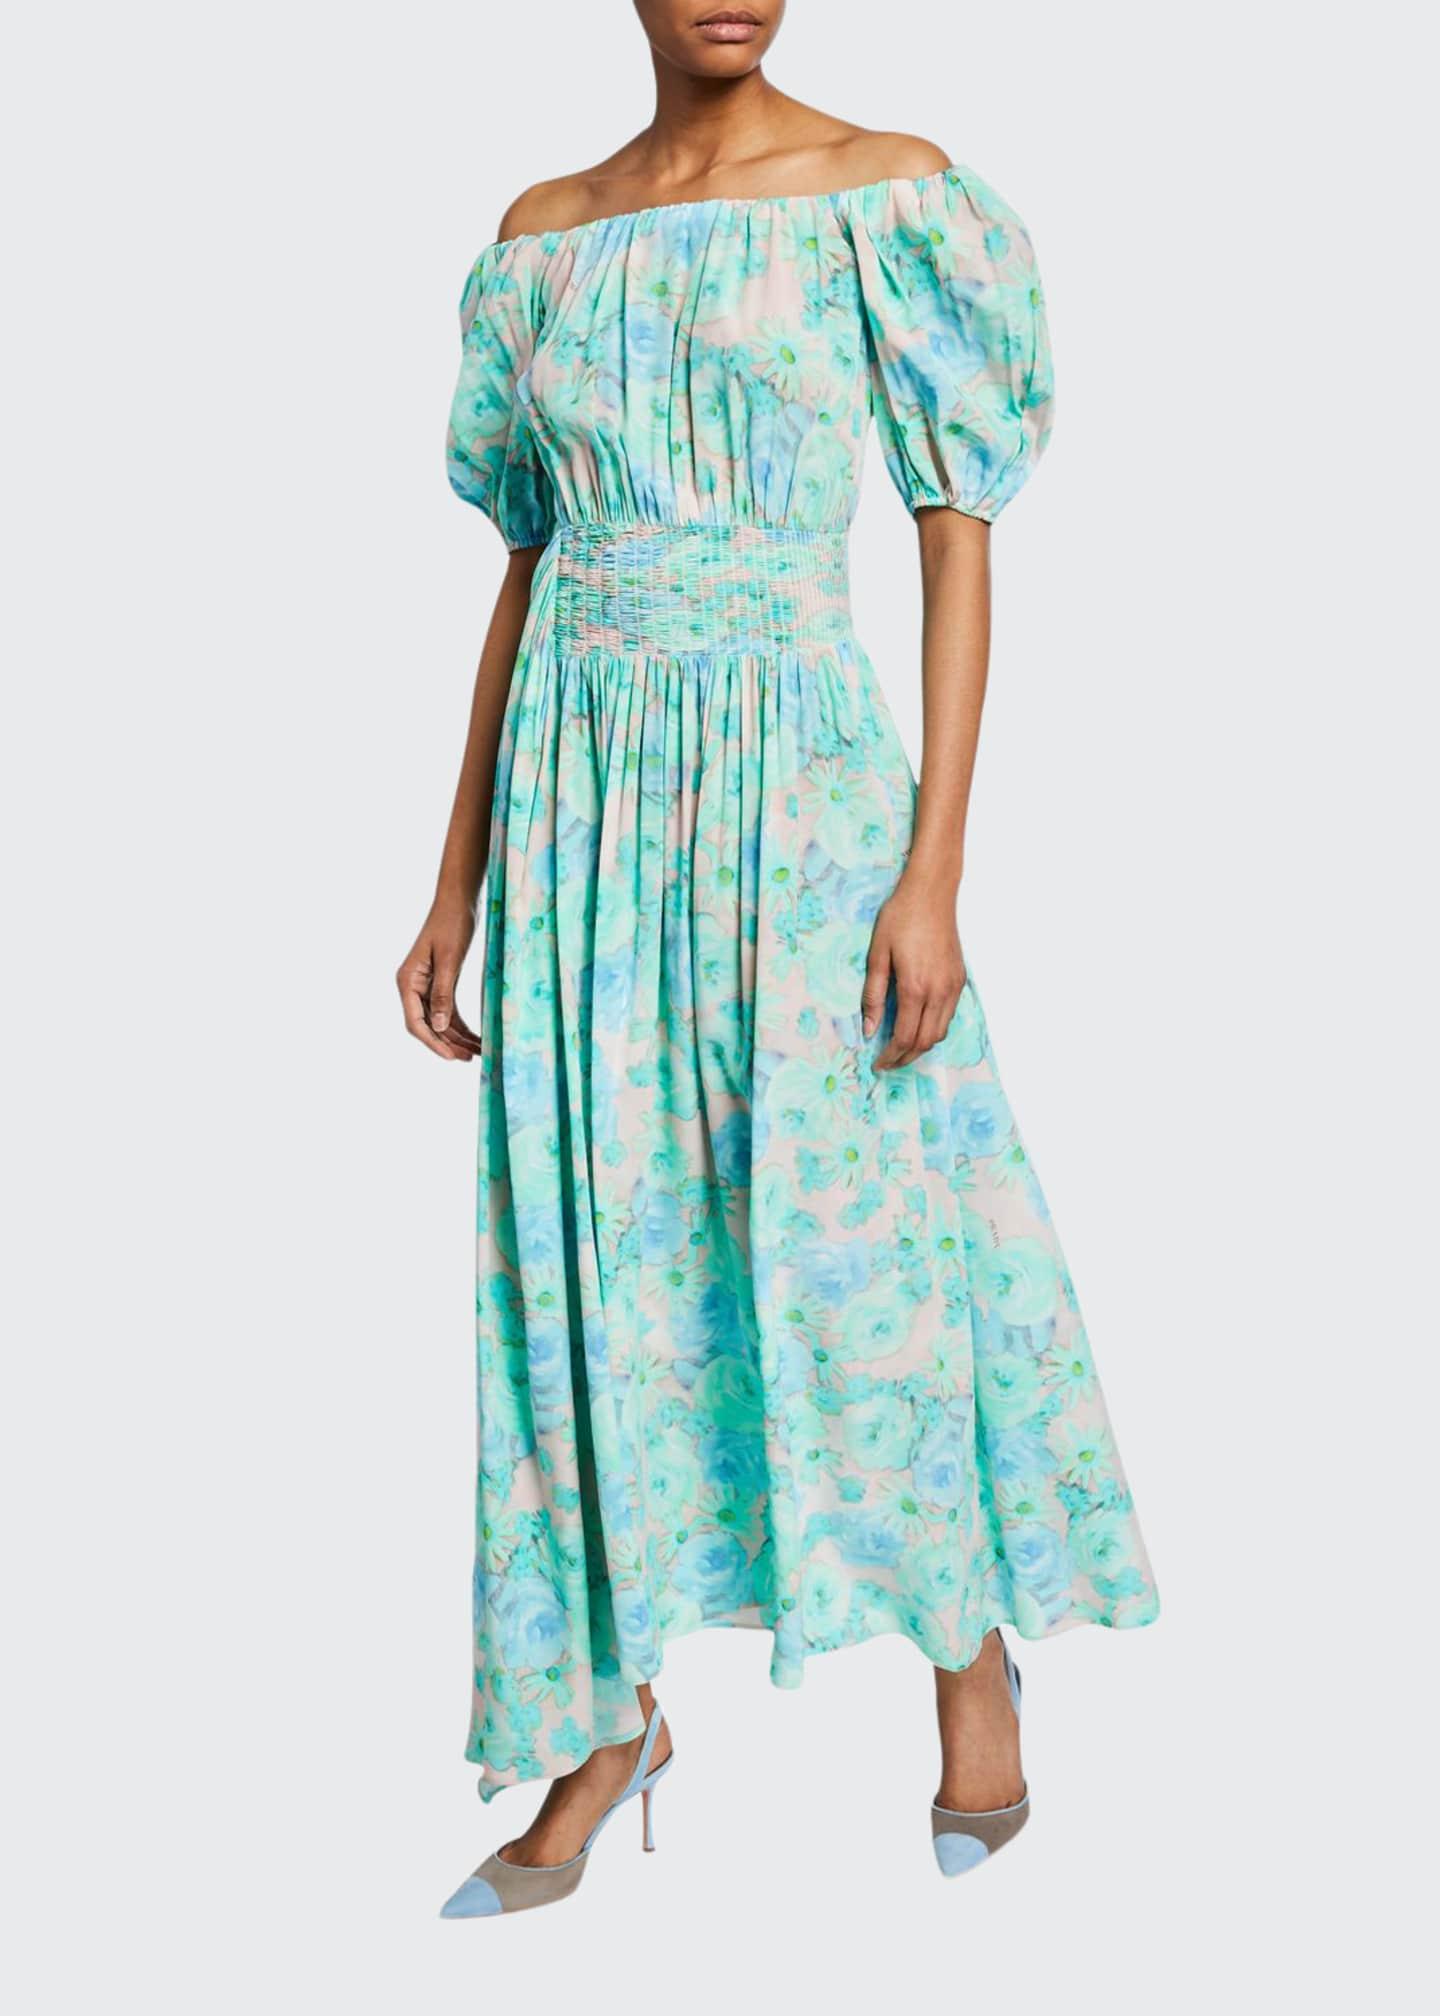 Prada Floral-Print Off-the-Shoulder Silk Dress